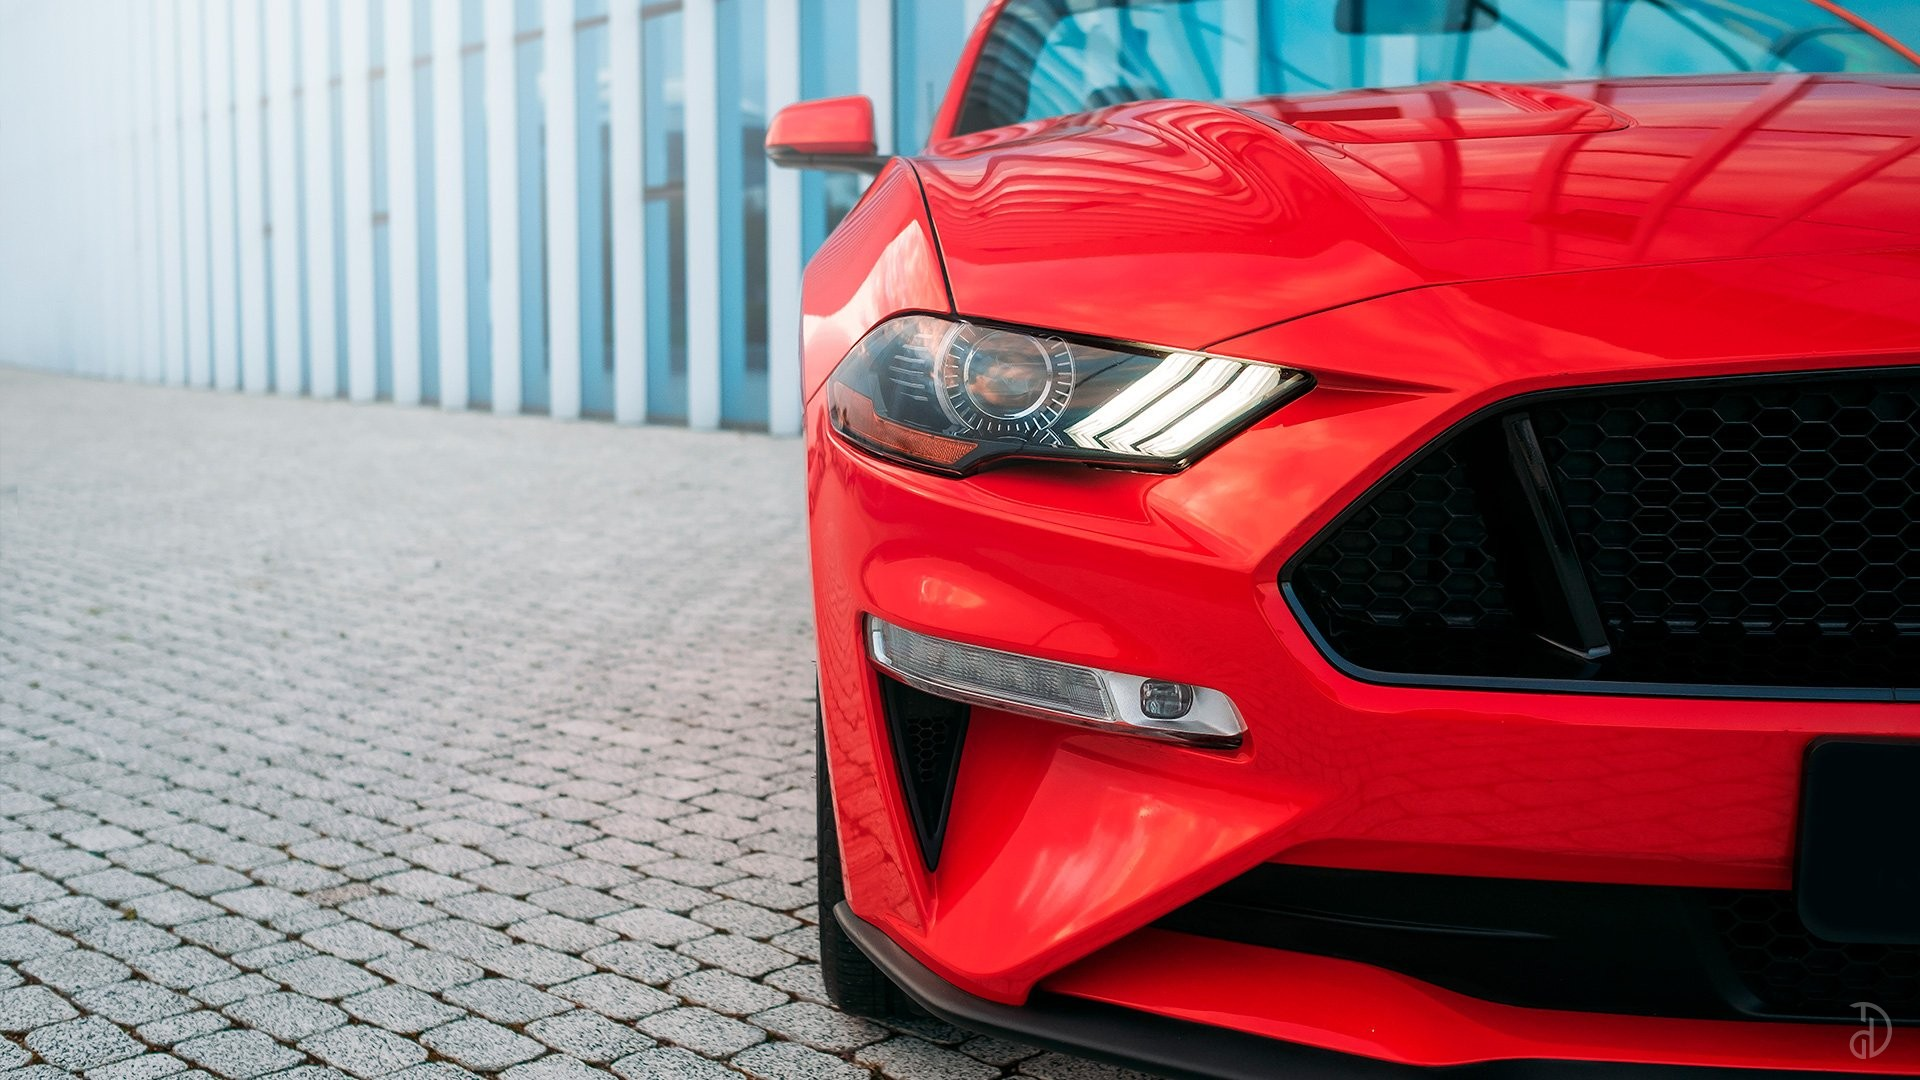 Аренда Ford Mustang GT 5.0  в Москве. Фото 8